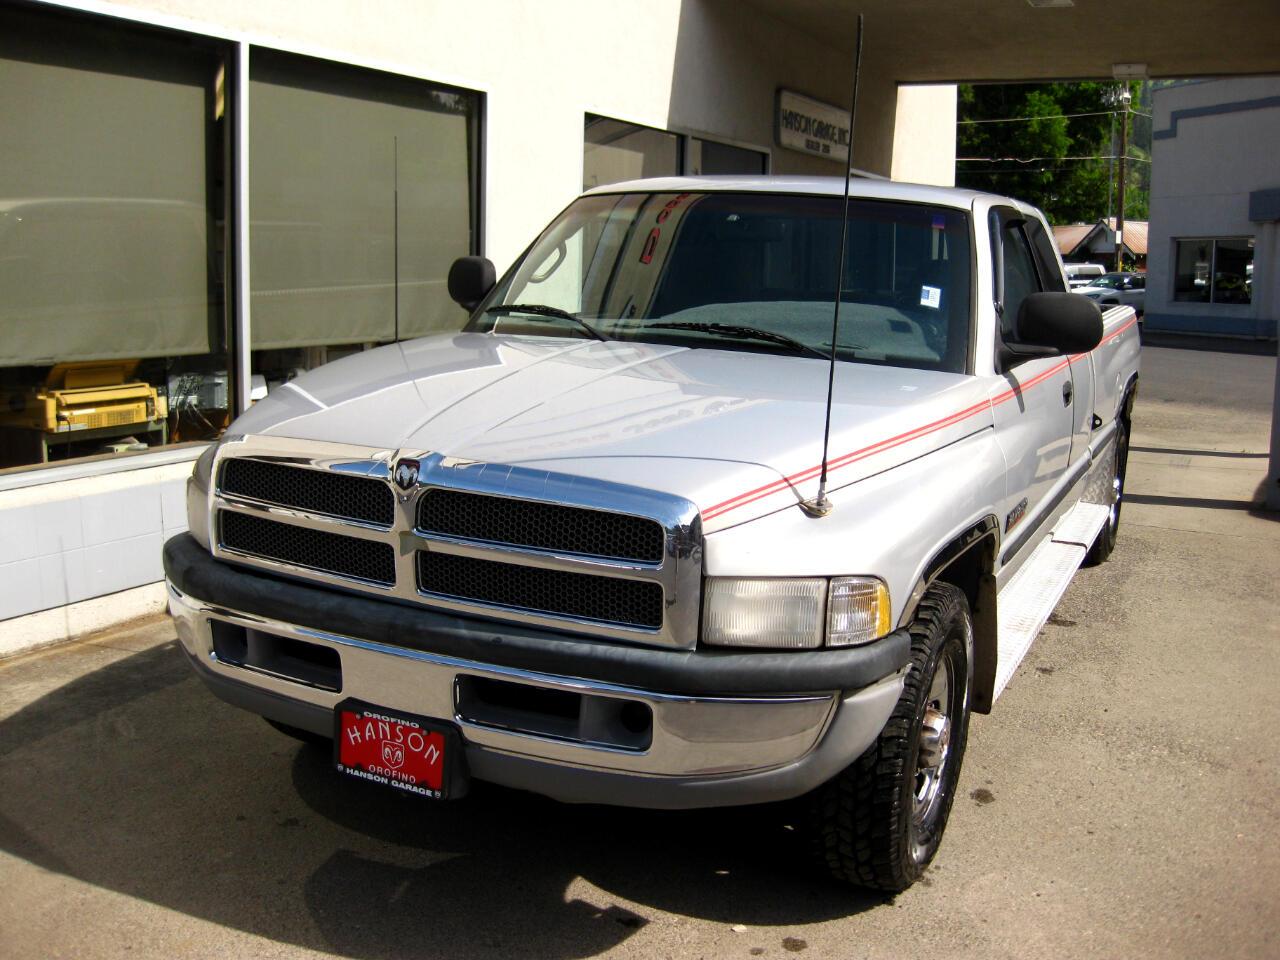 "1998 Dodge Ram 2500 4dr Quad Cab 139"" WB HD"